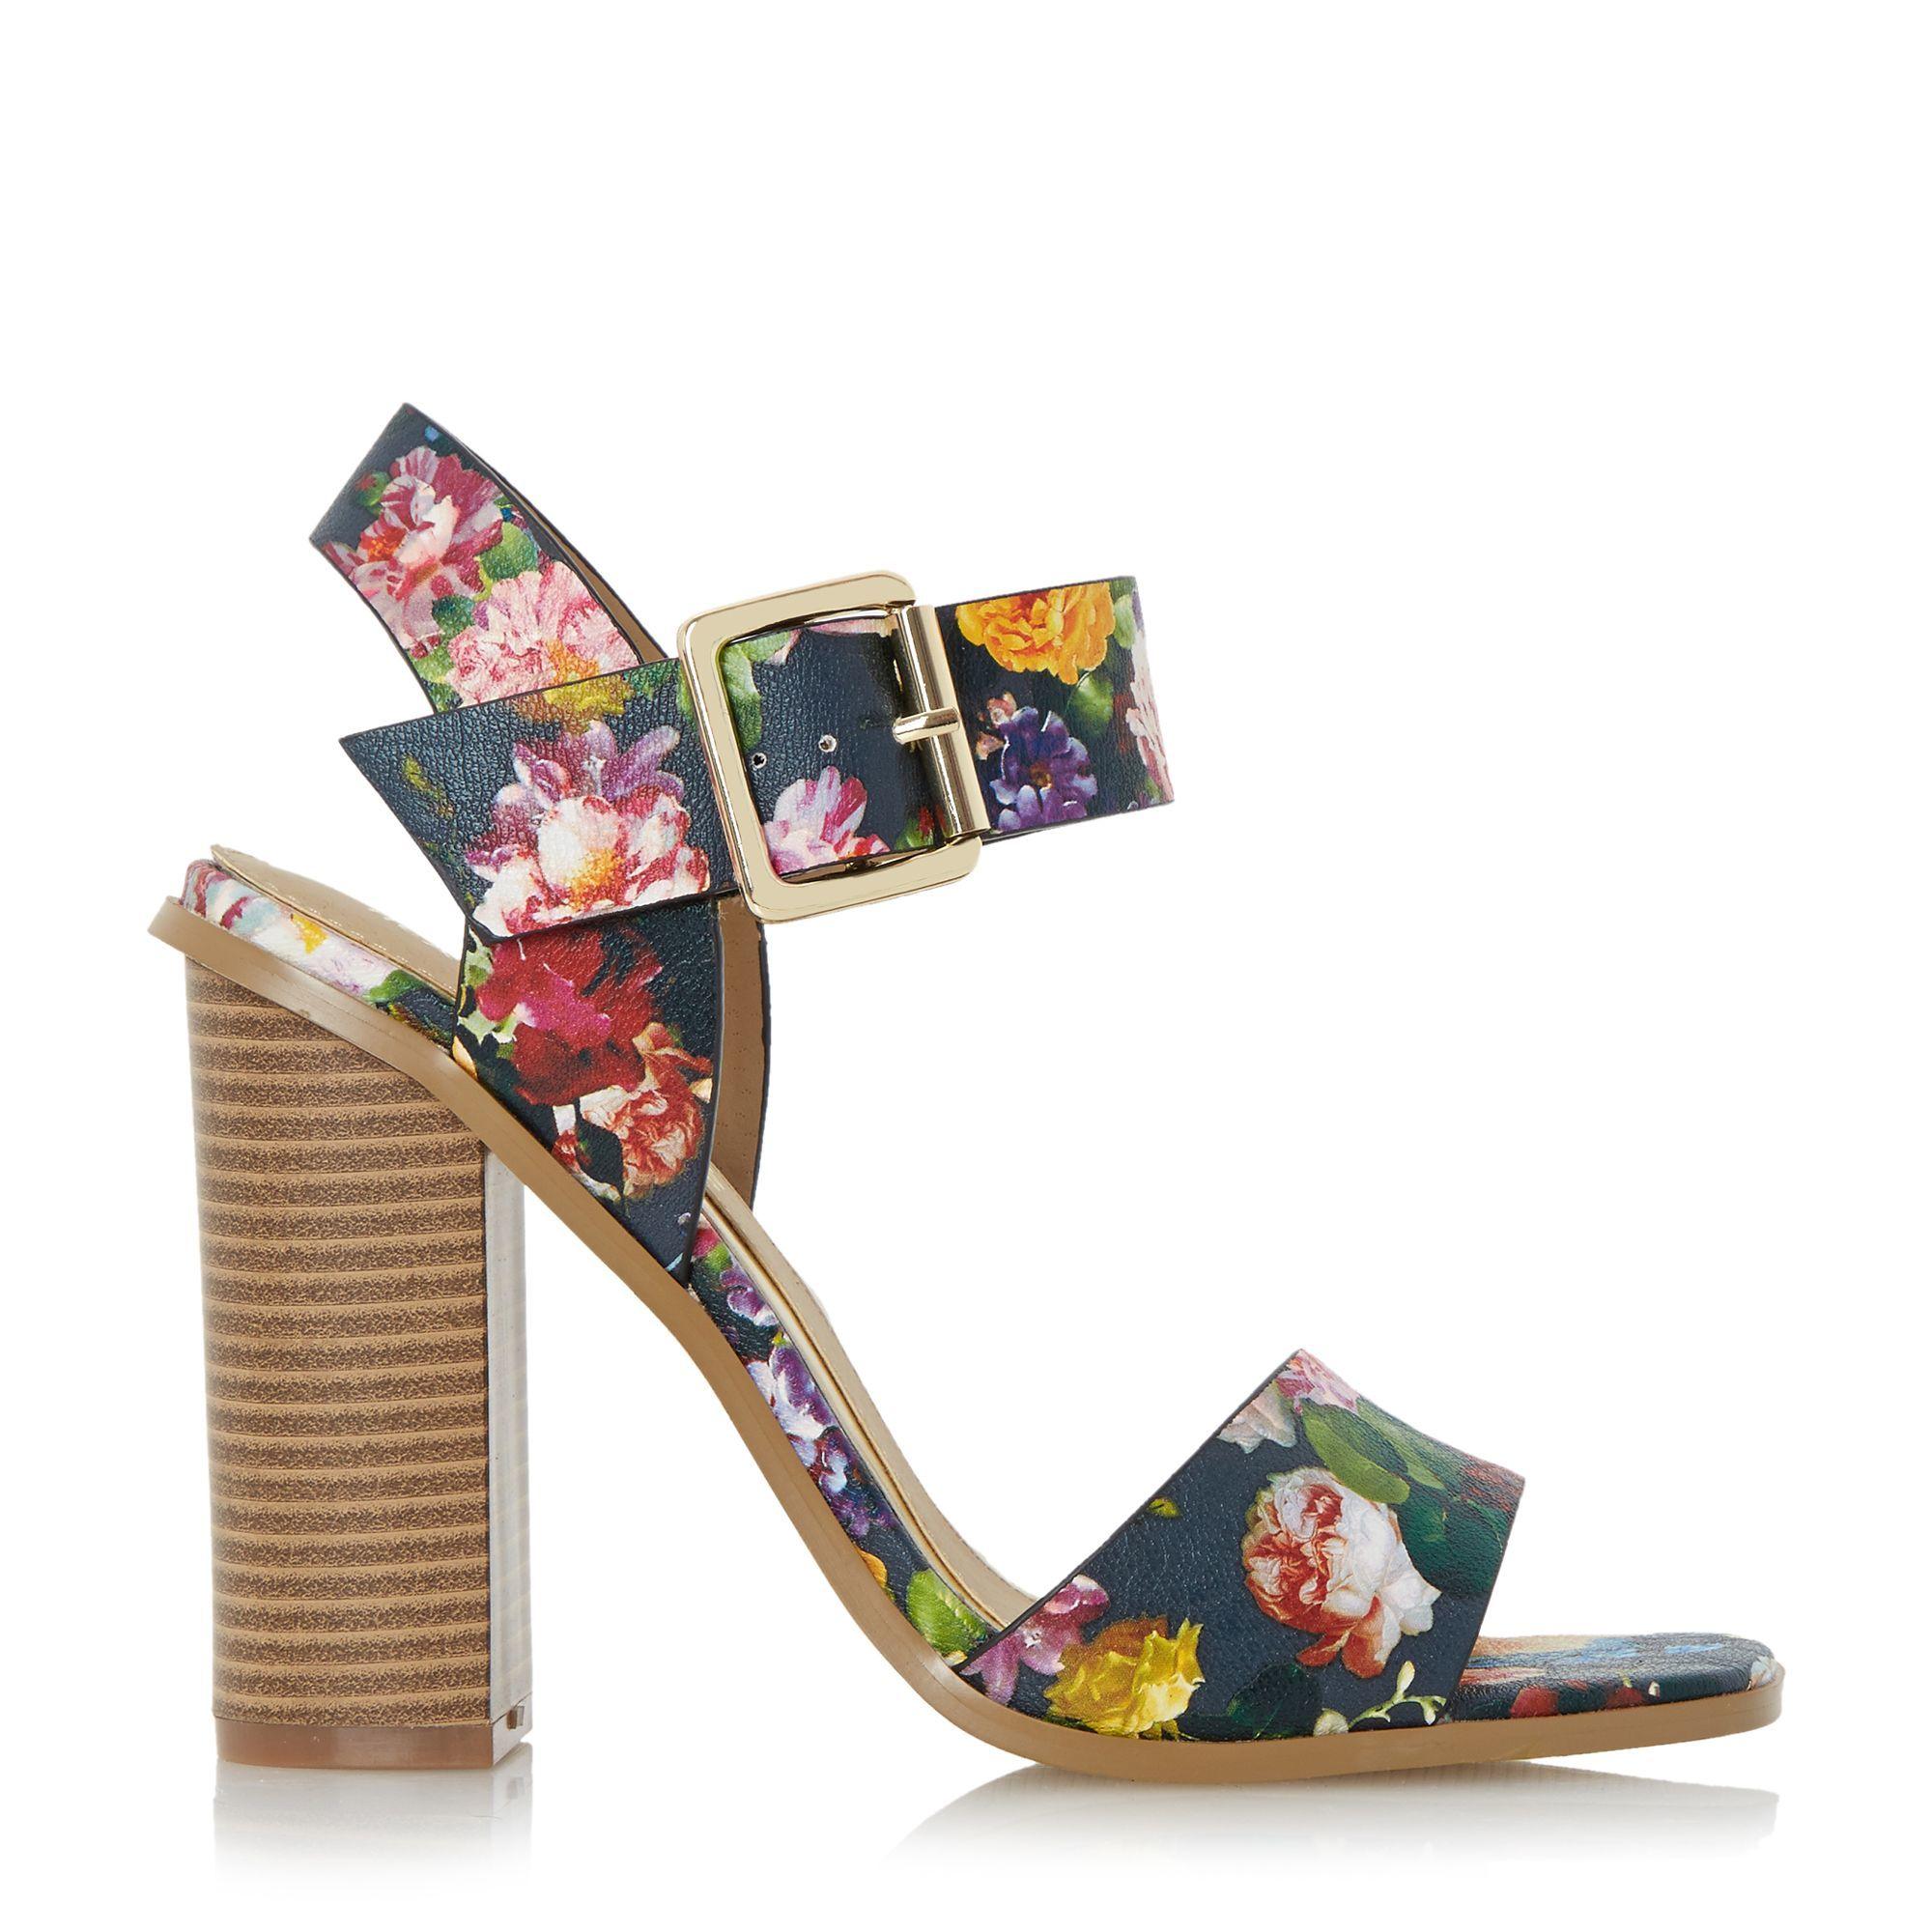 96fff39bc6 Buy Dune Women's Multicolor Ilana Chunky Block Heel Sandals, starting at  €18. Similar